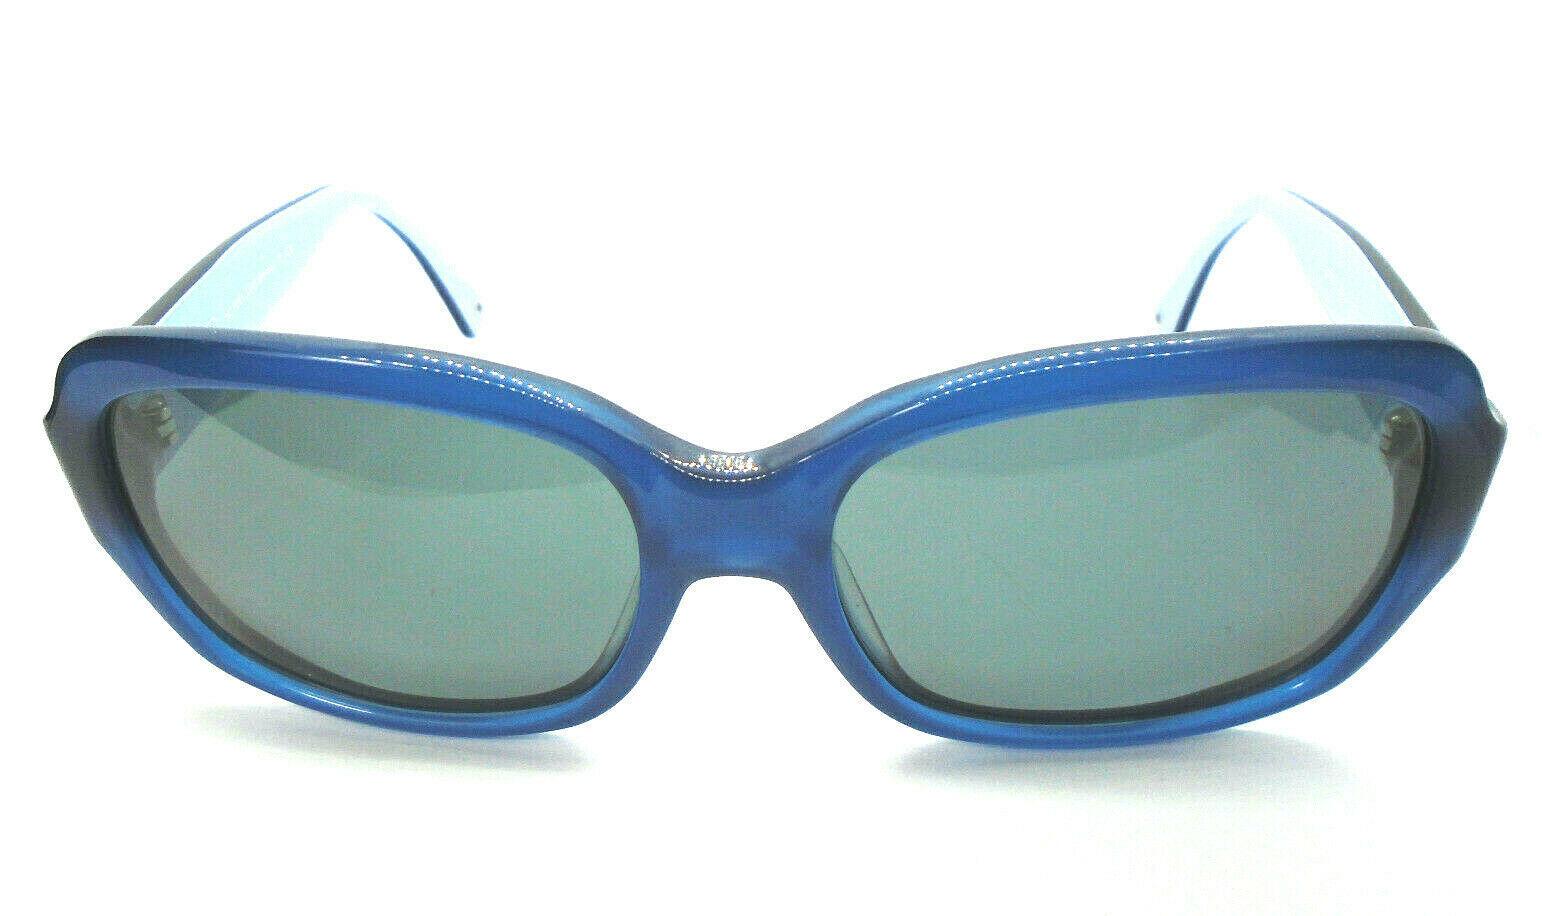 Coach Rx Sunglasses/Eyeglass Frames Emma HC8001 L001 5056/11 Blue 57-17-135 - $44.99